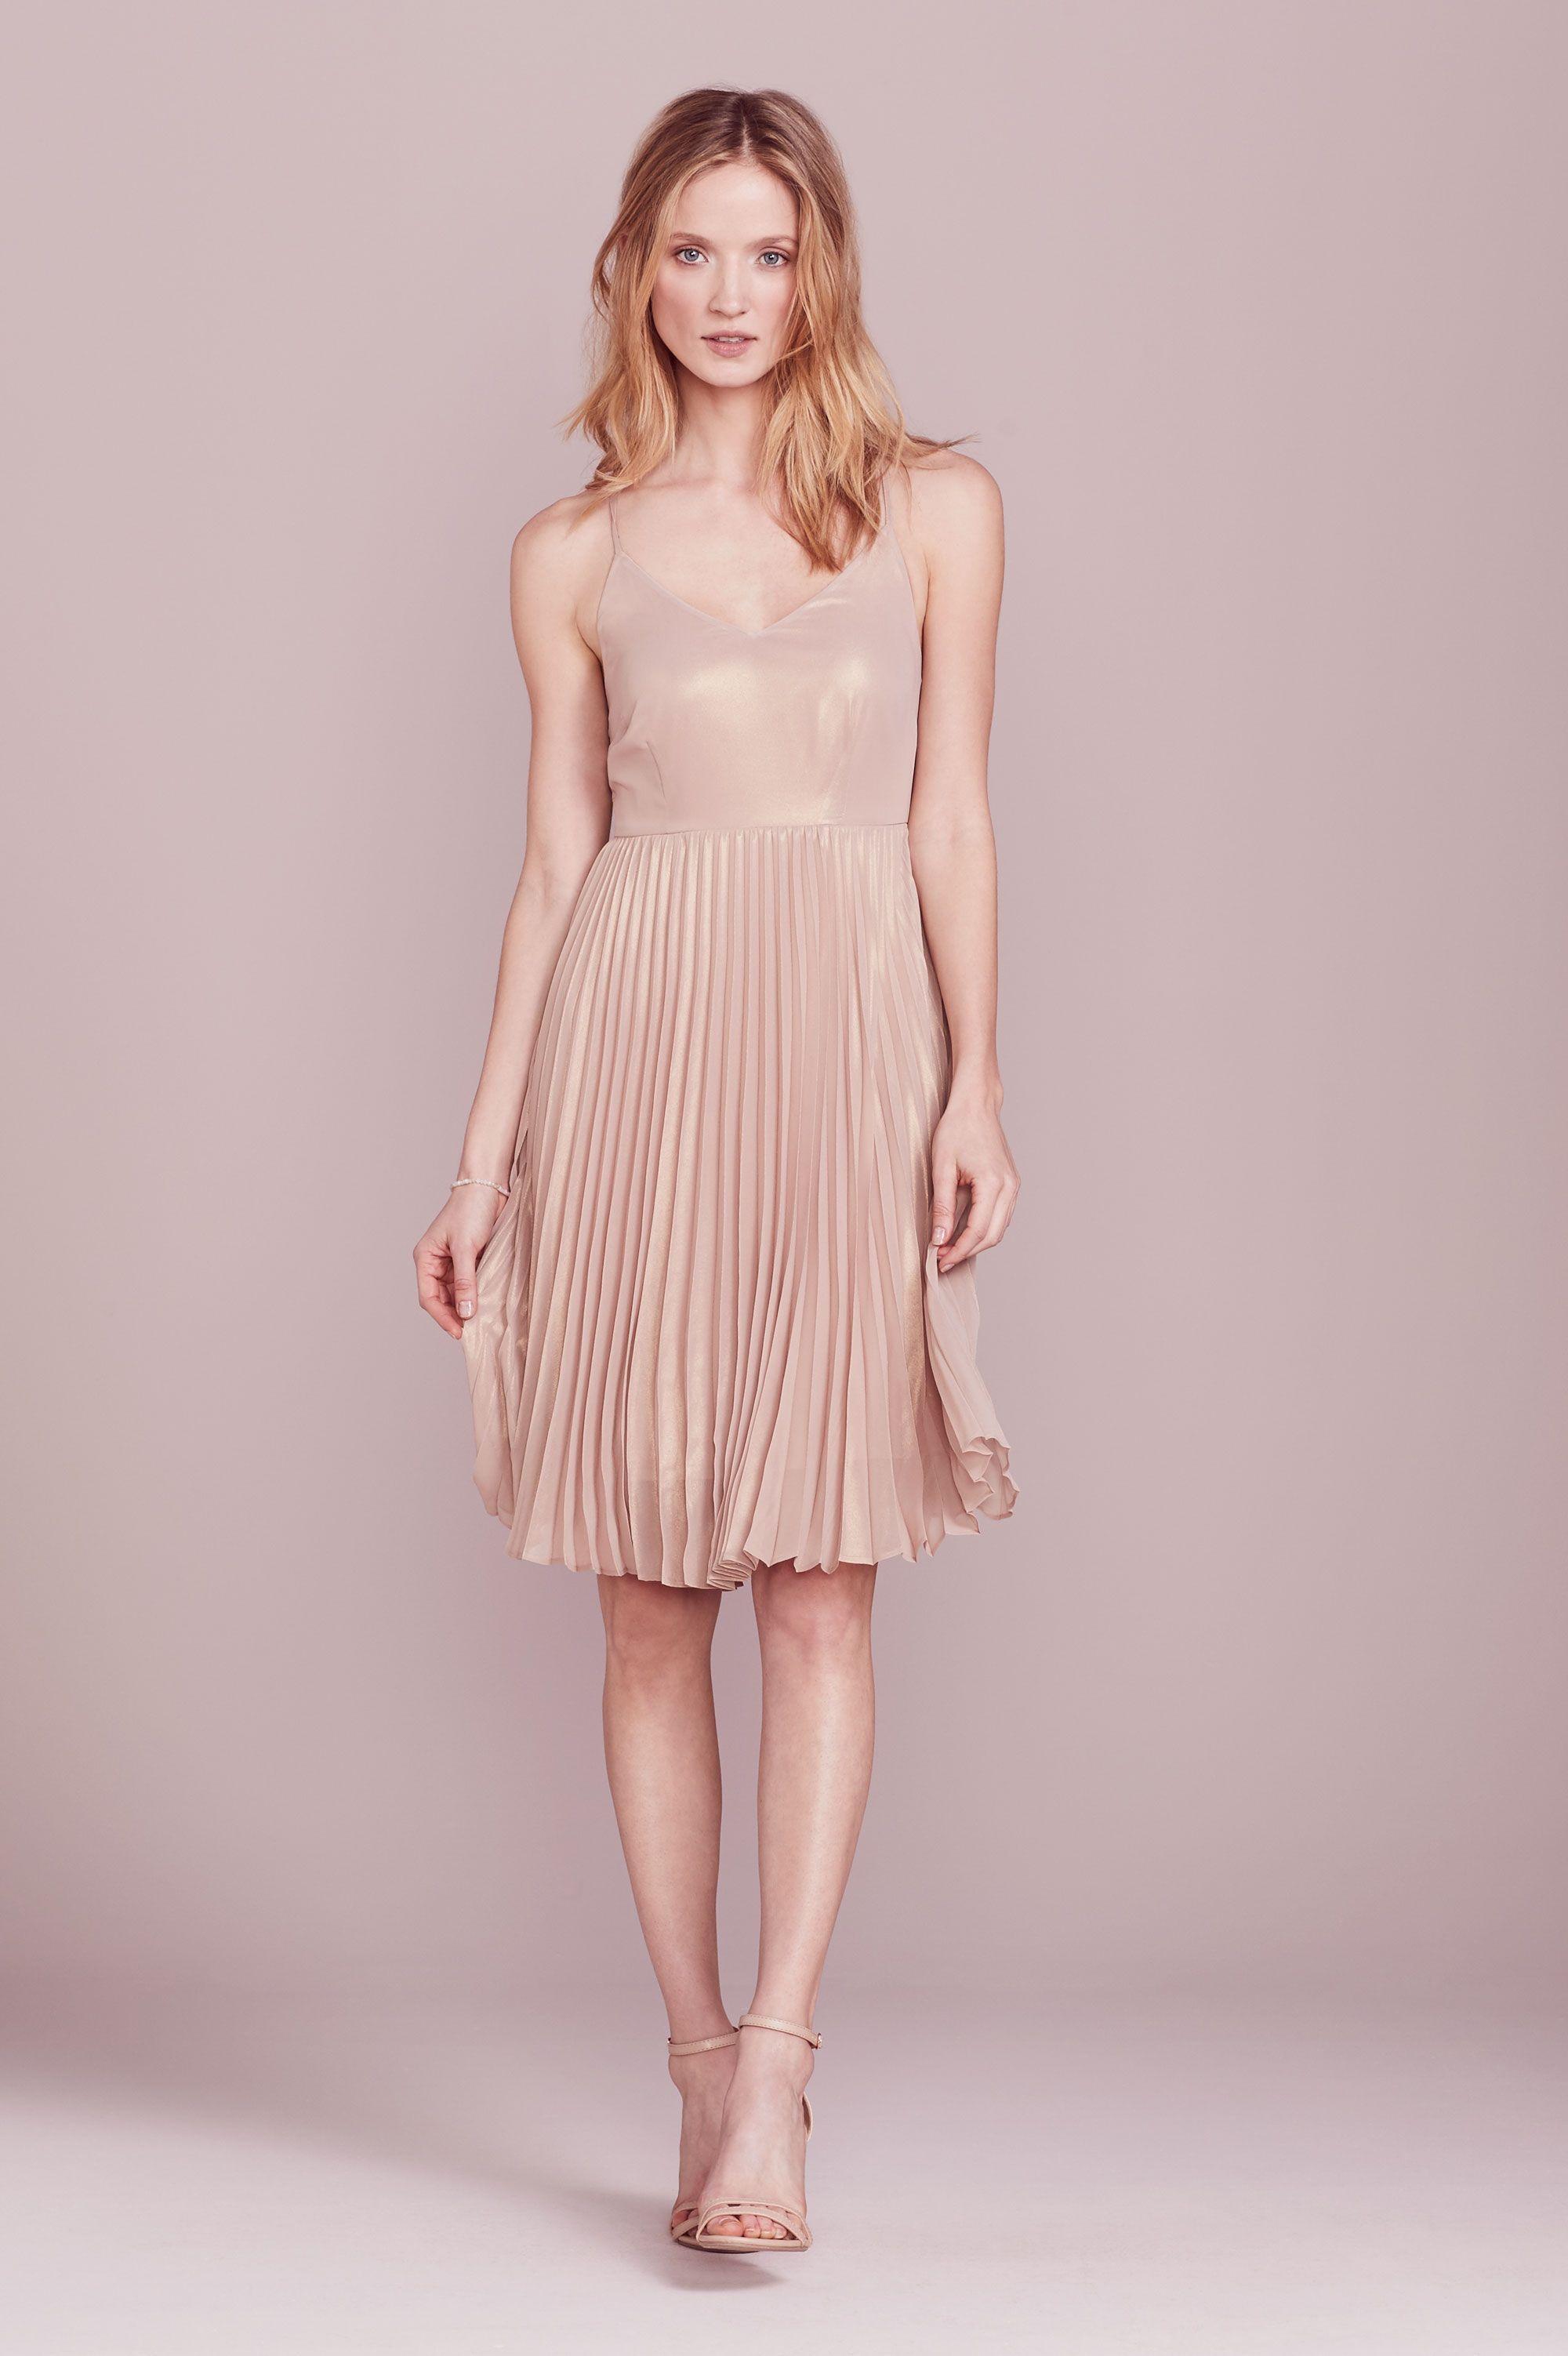 Lauren Conrad\'s Prom Dress Made Her Look Like A Pumpkin, & She Has ...